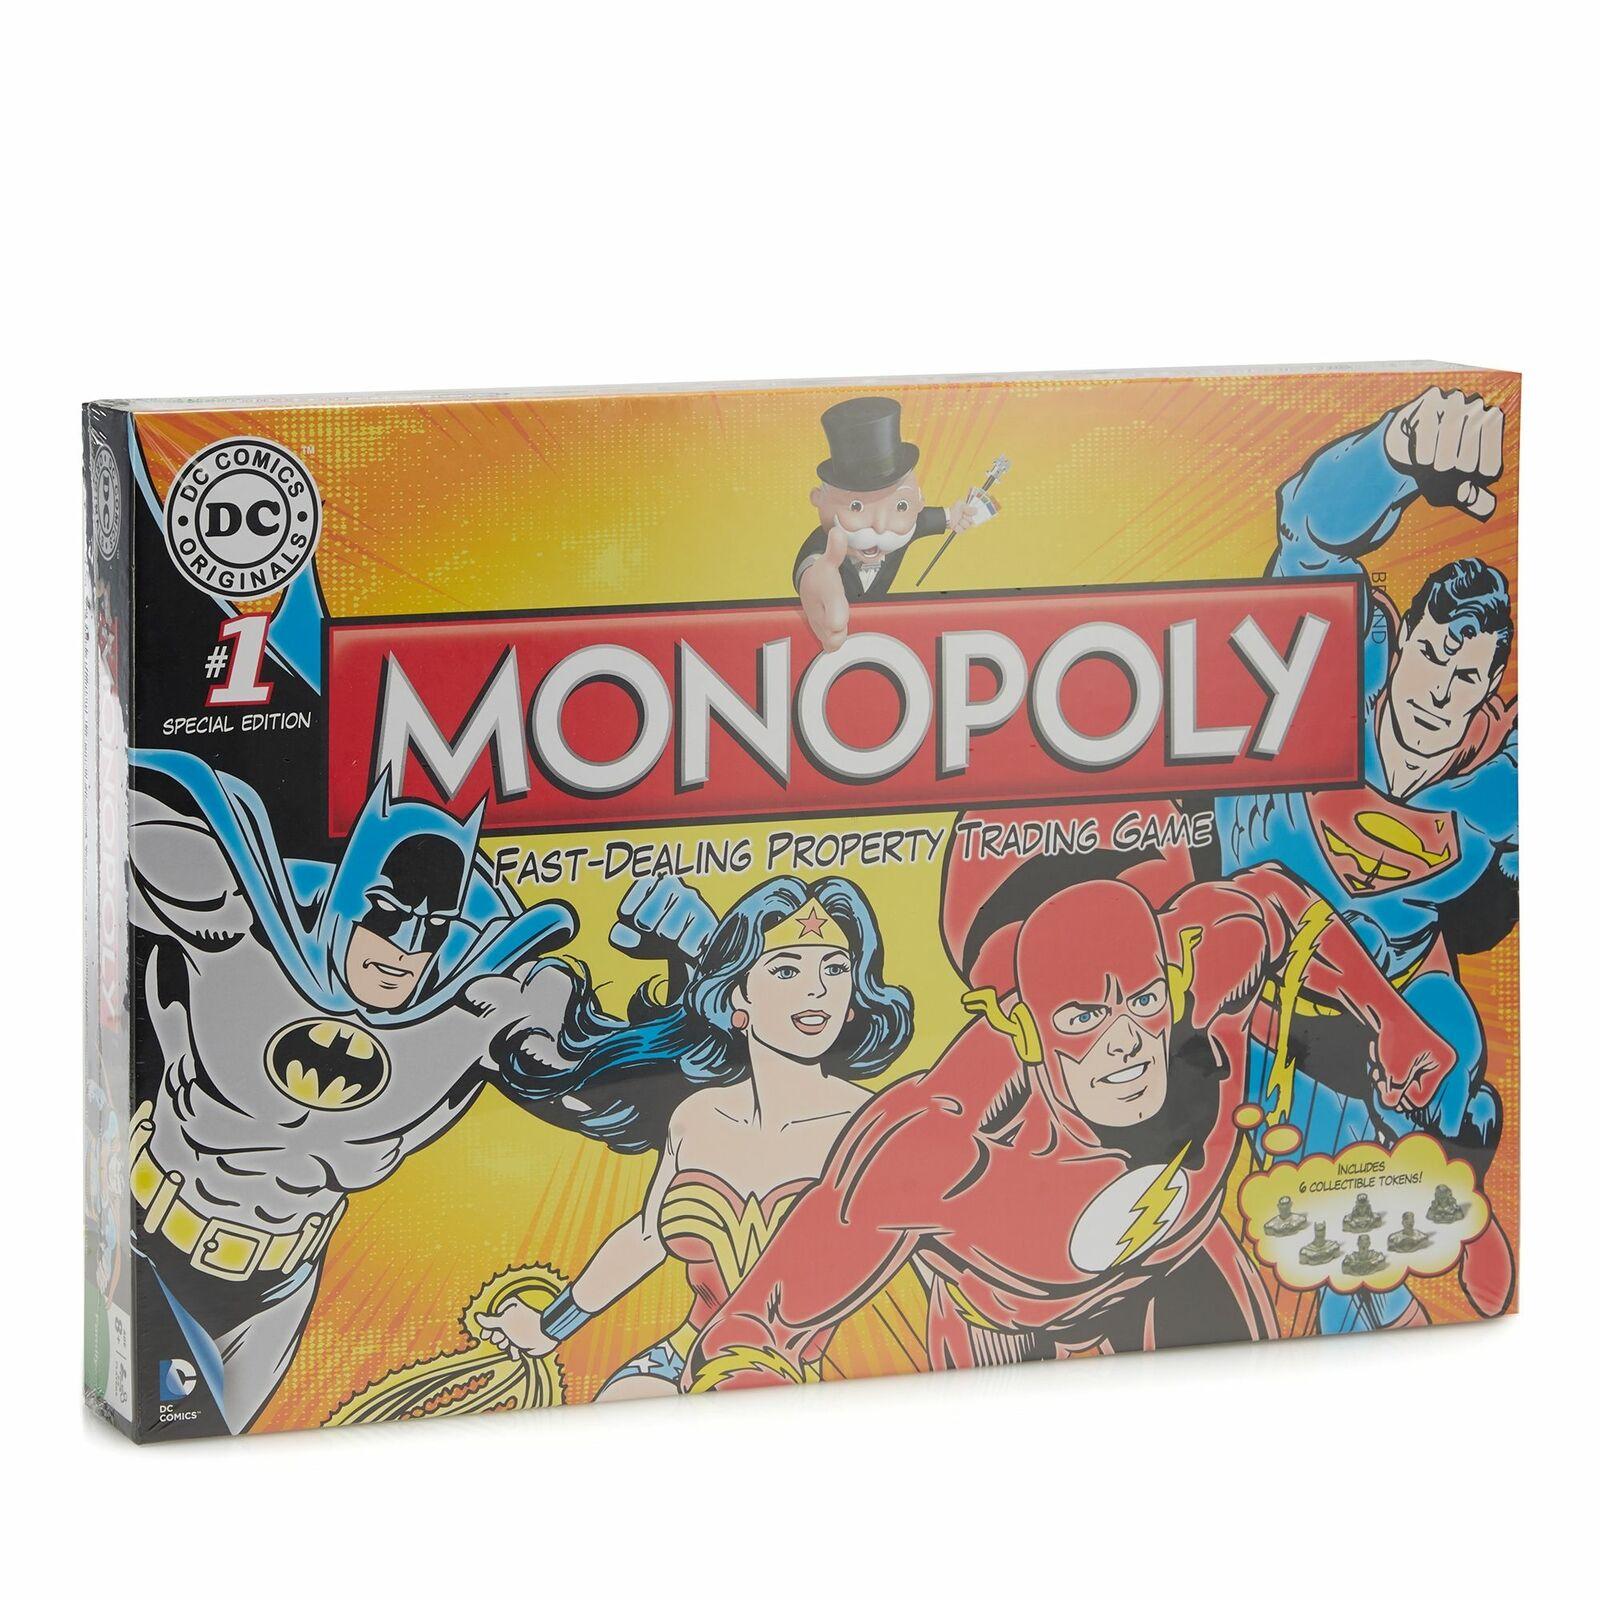 Dc Comics Superheroes Monopoly @ Ebay Sold By Debenhams £12.49 Delivered